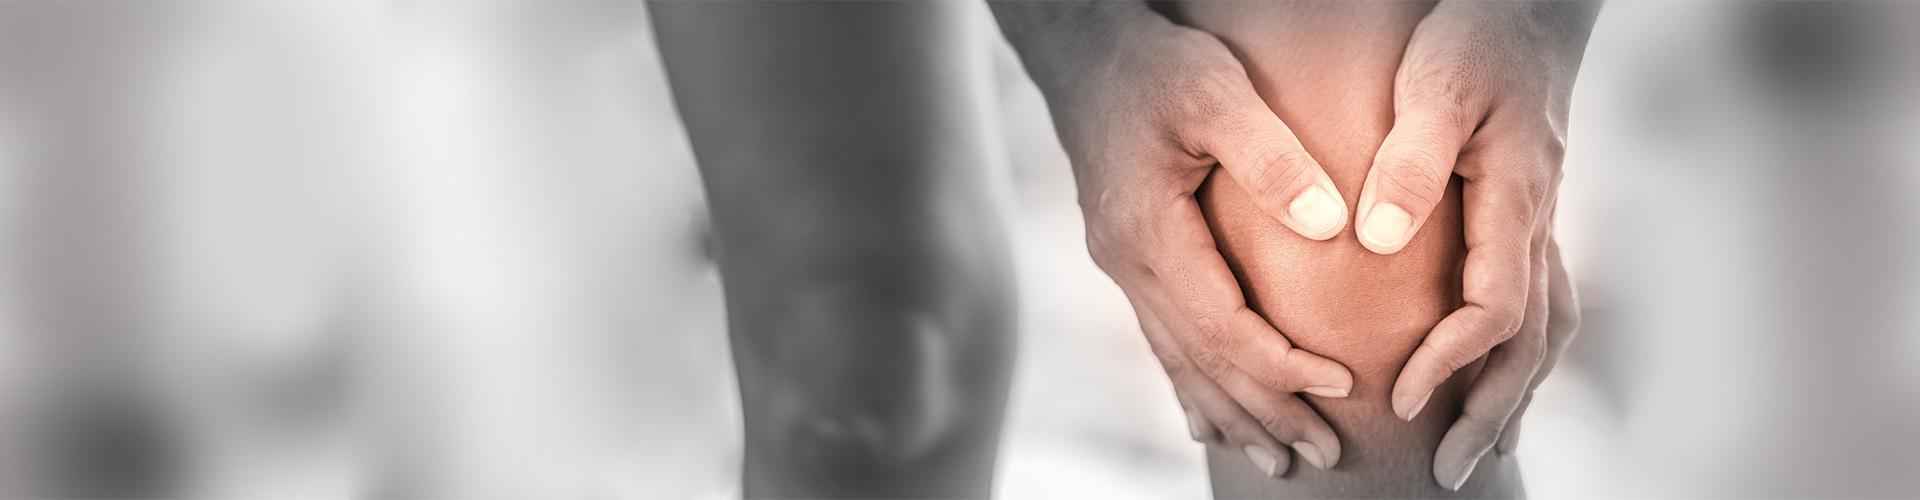 STIWELL Neurorehabilitation | Informationen zu Meniskusriss